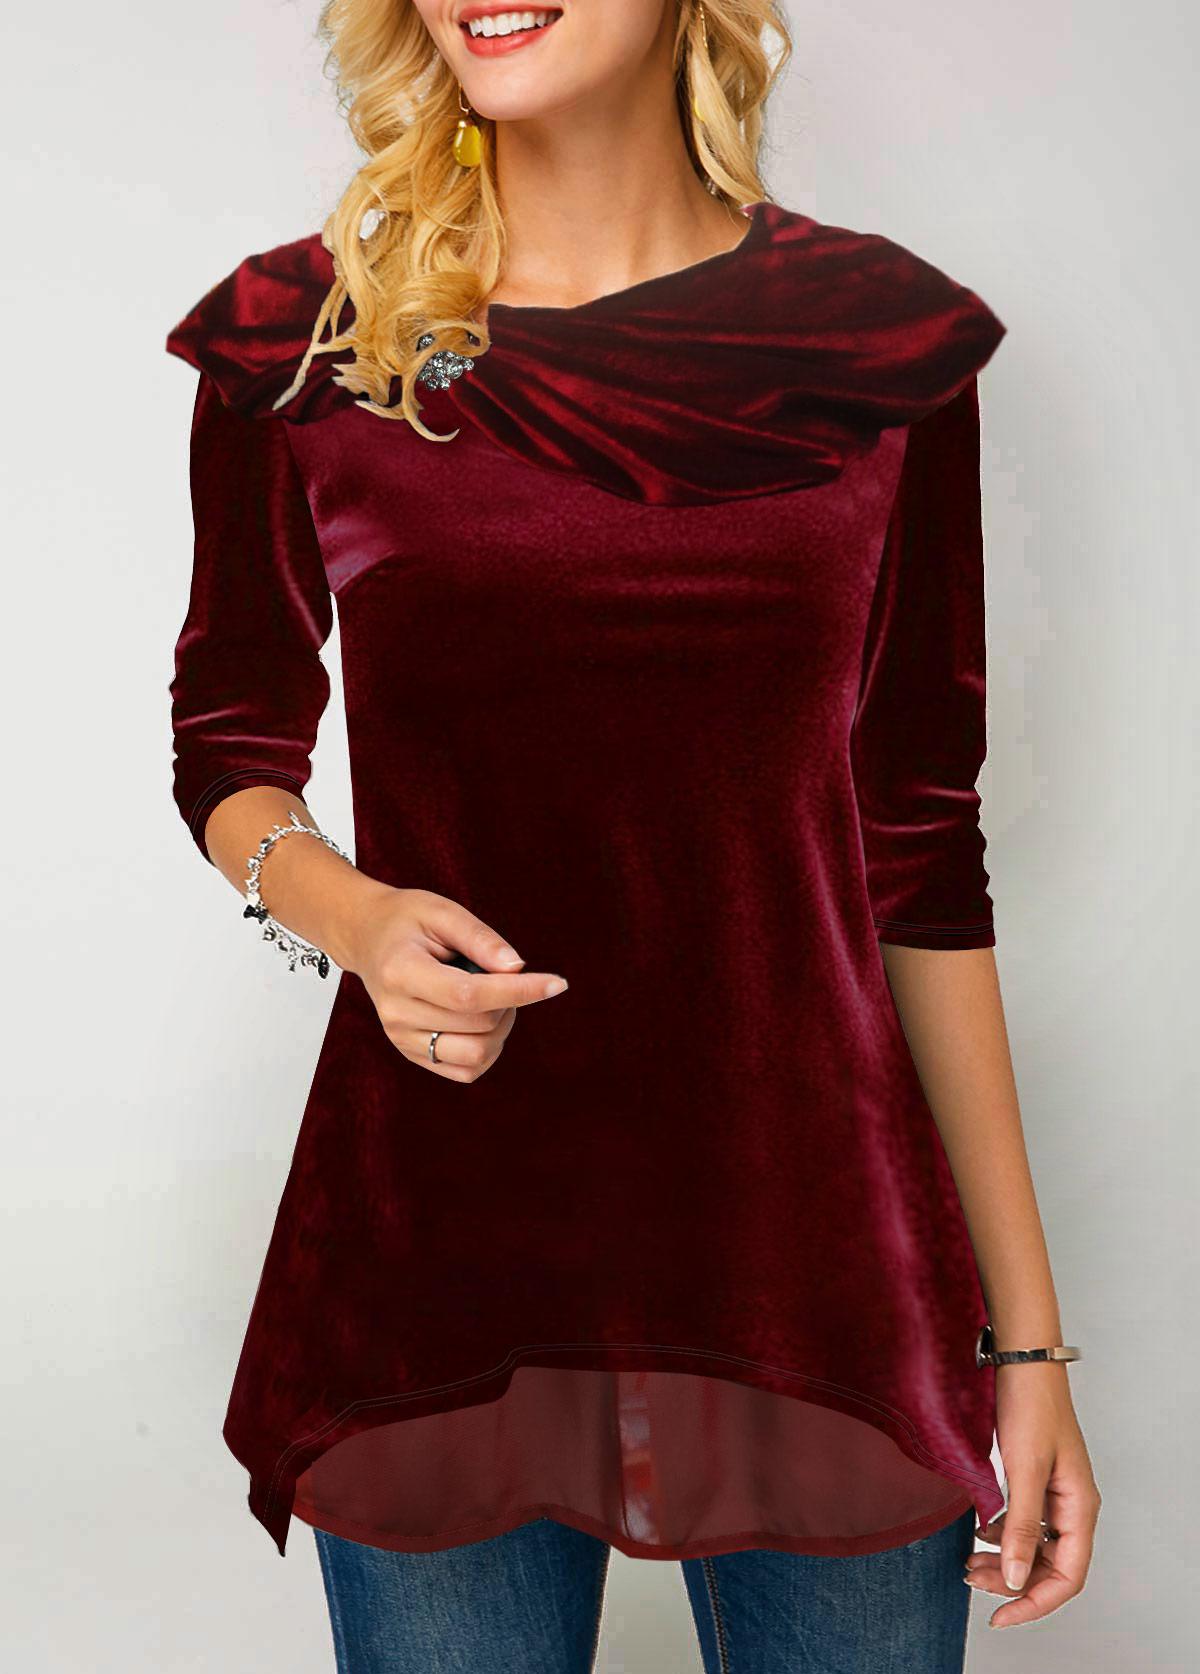 ROTITA Layered Hem Rhinestone Embellished Wine Red T Shirt